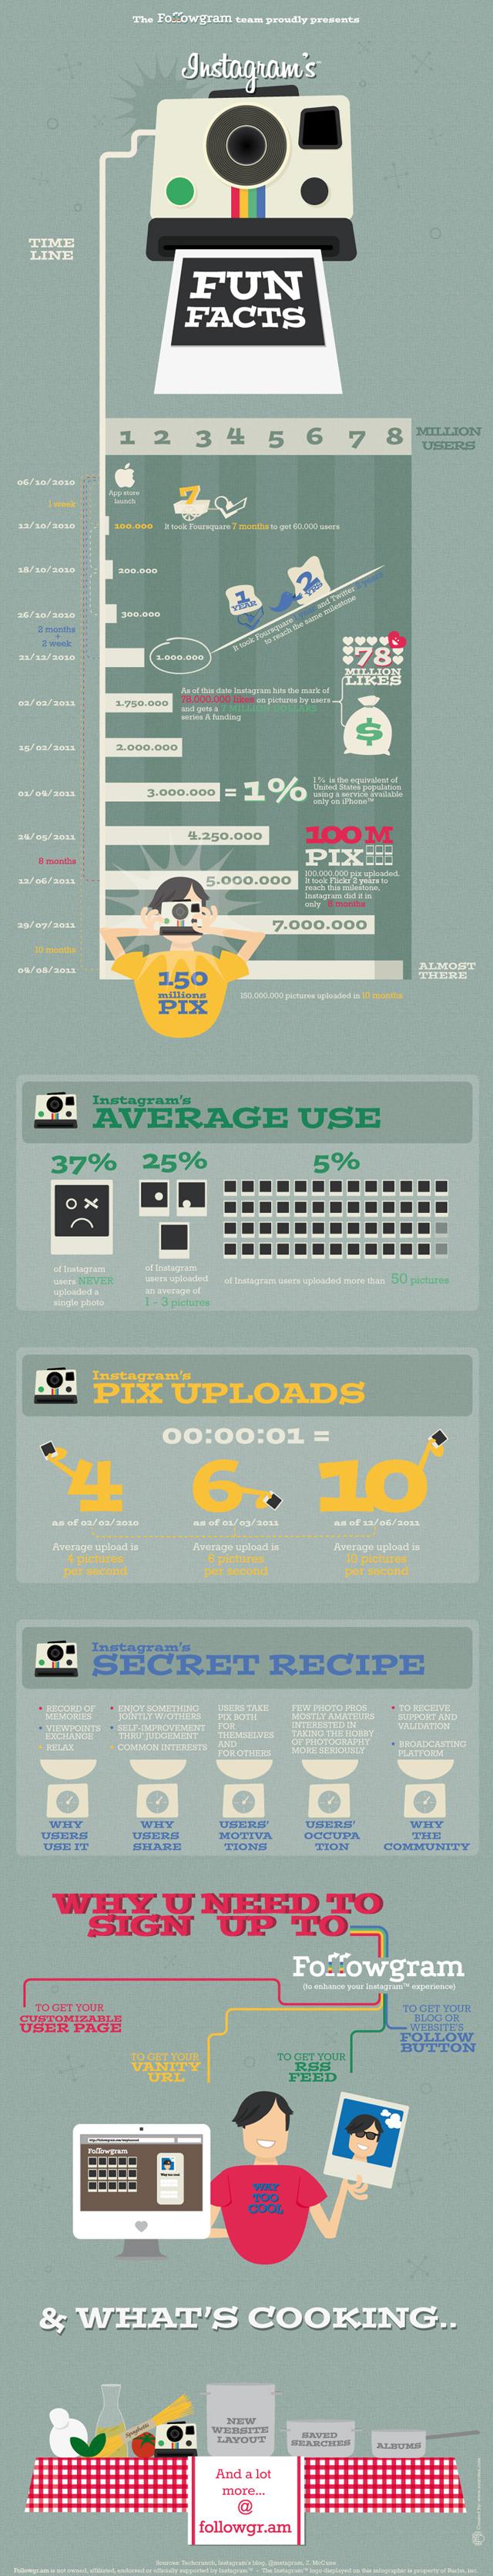 infographic instagram big - Instagram, les statistiques [Infographique]